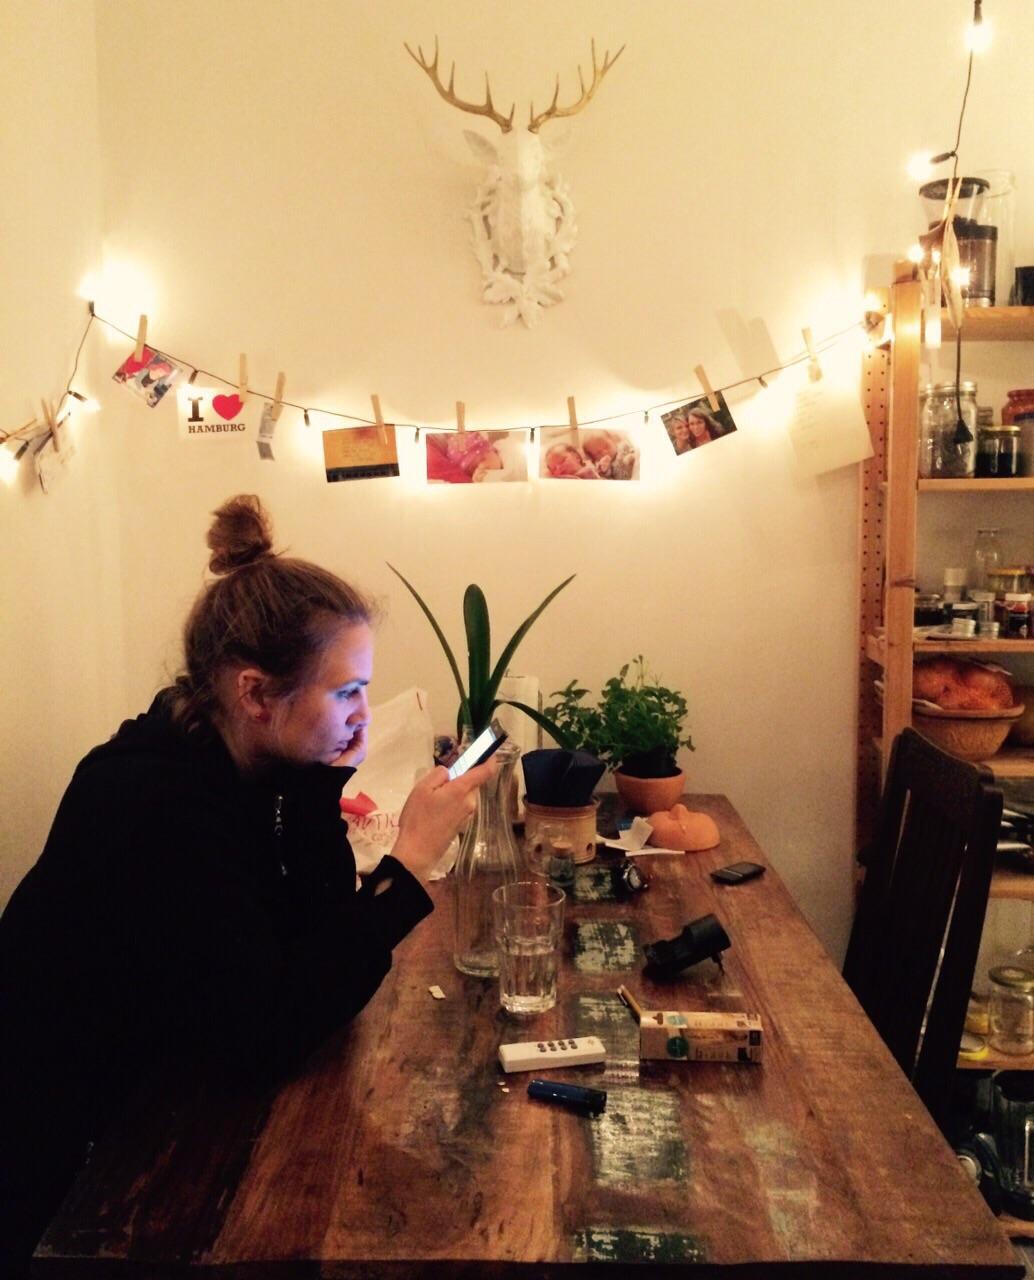 #messyhairbun #küche #zitronenmelisseimtopf #hashtag